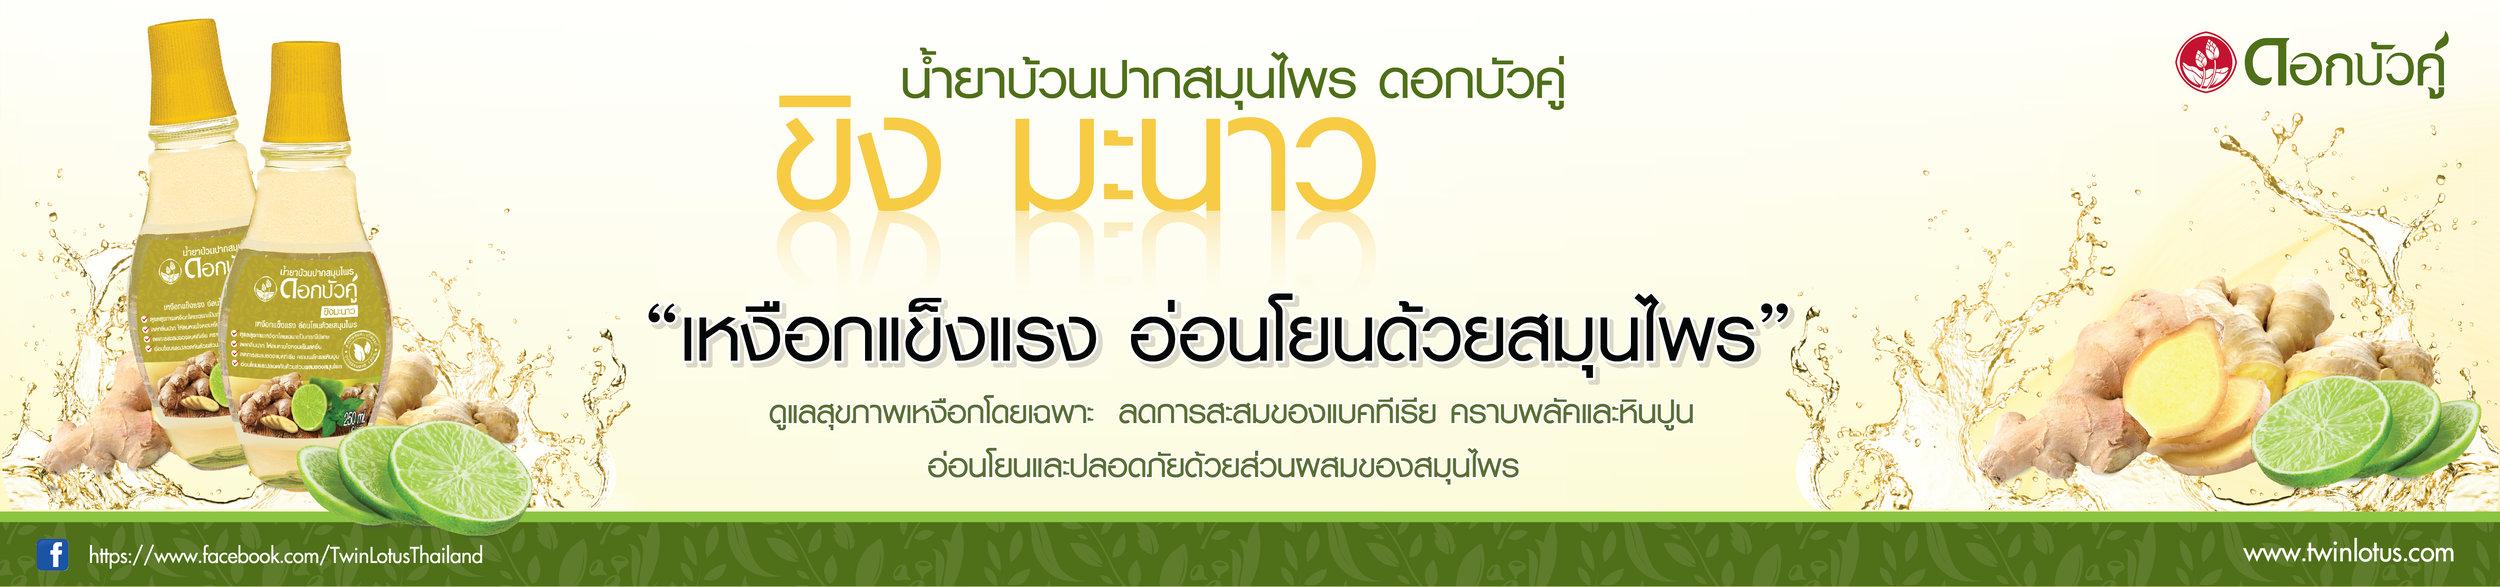 Banner Website_น้ำยาบ้วนขิงมะนาว-01.jpg